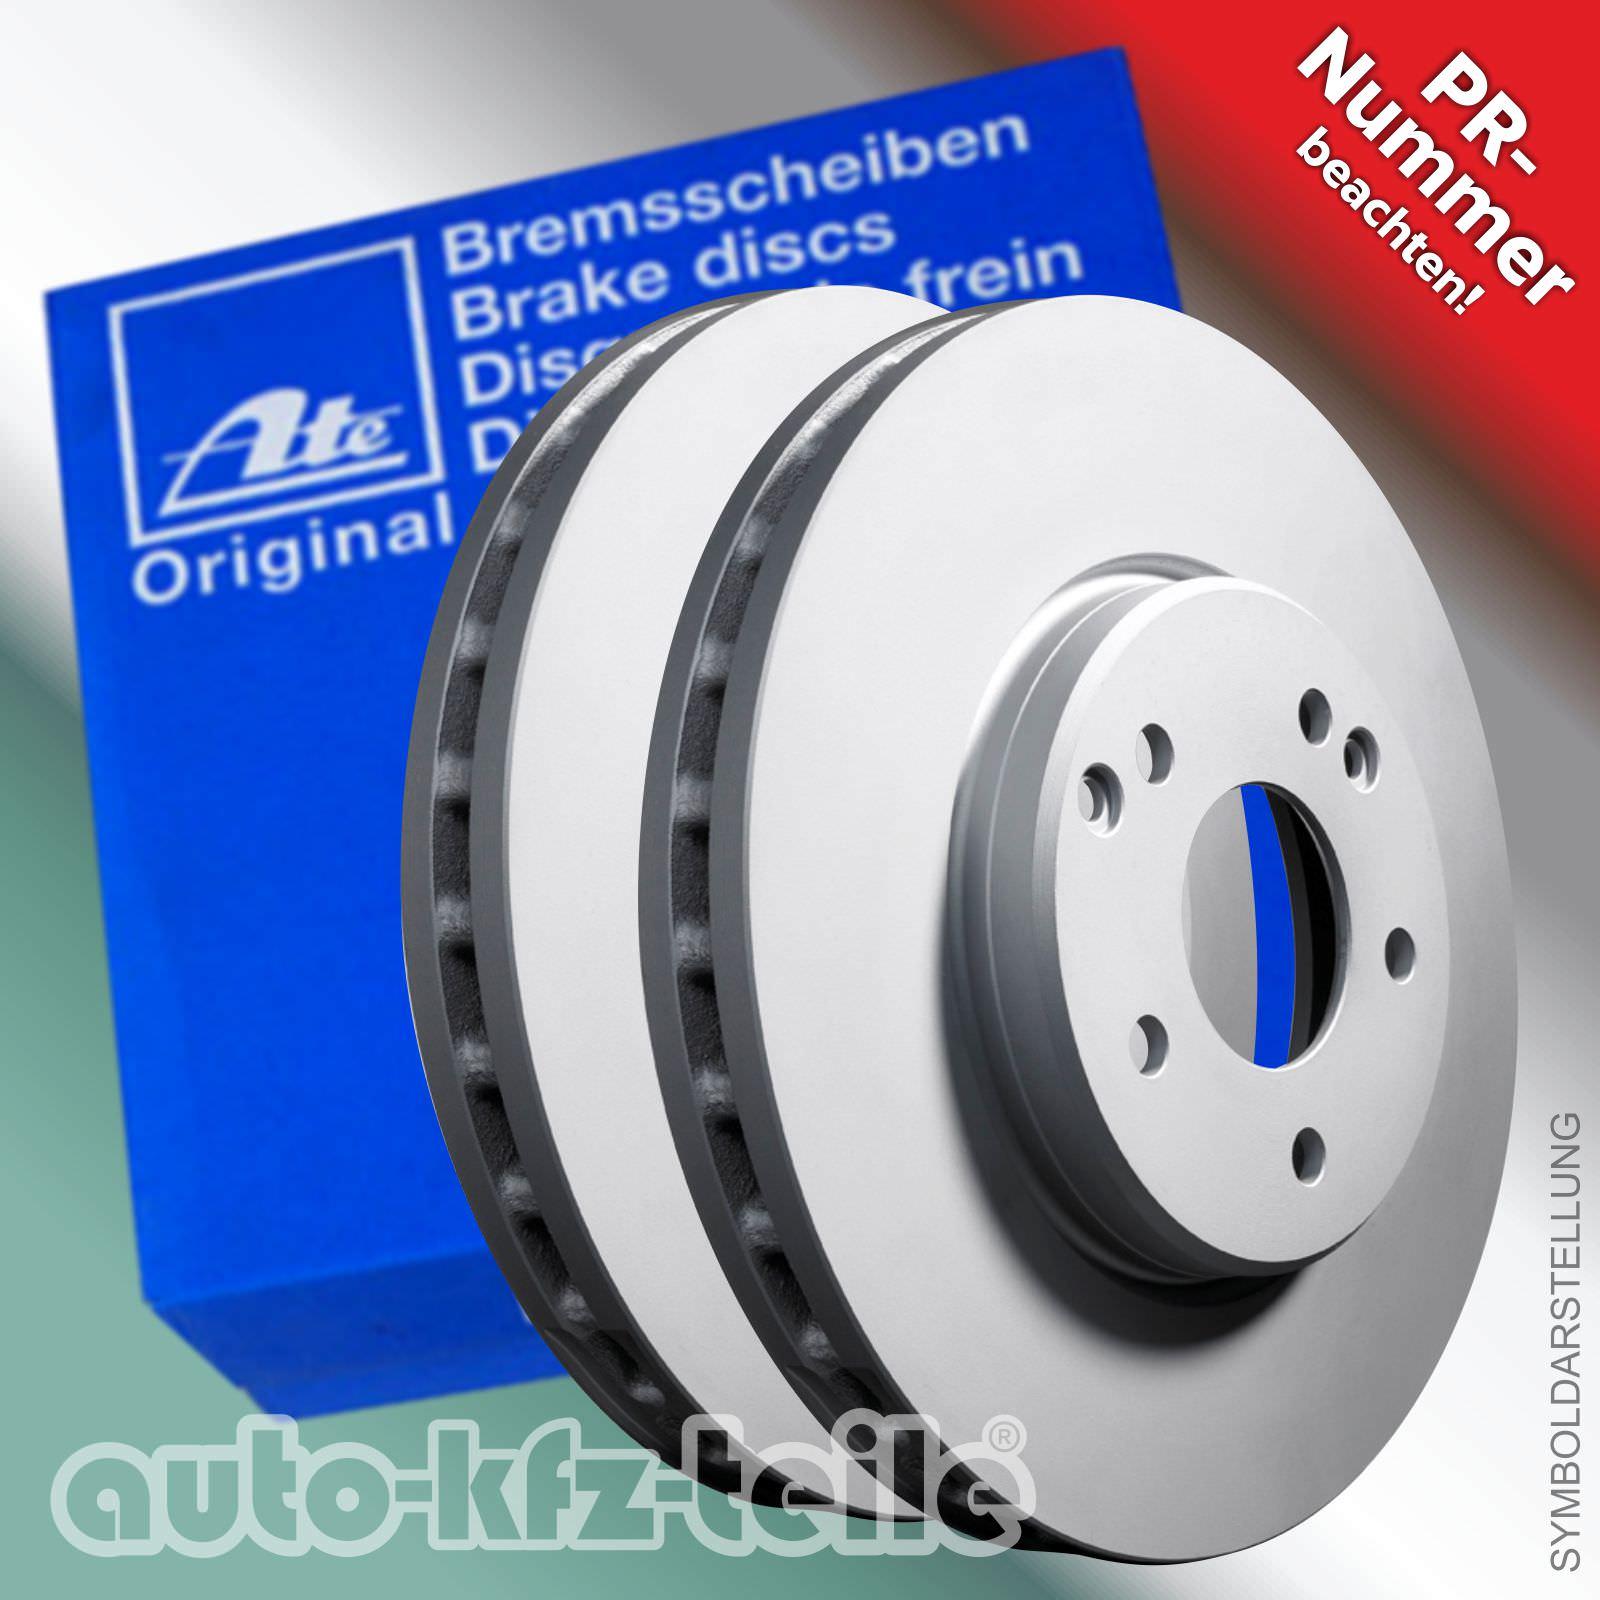 Beläge ATE Bremsscheiben 280mm belüftet Warnkontakt VORNE AUDI VW SEAT